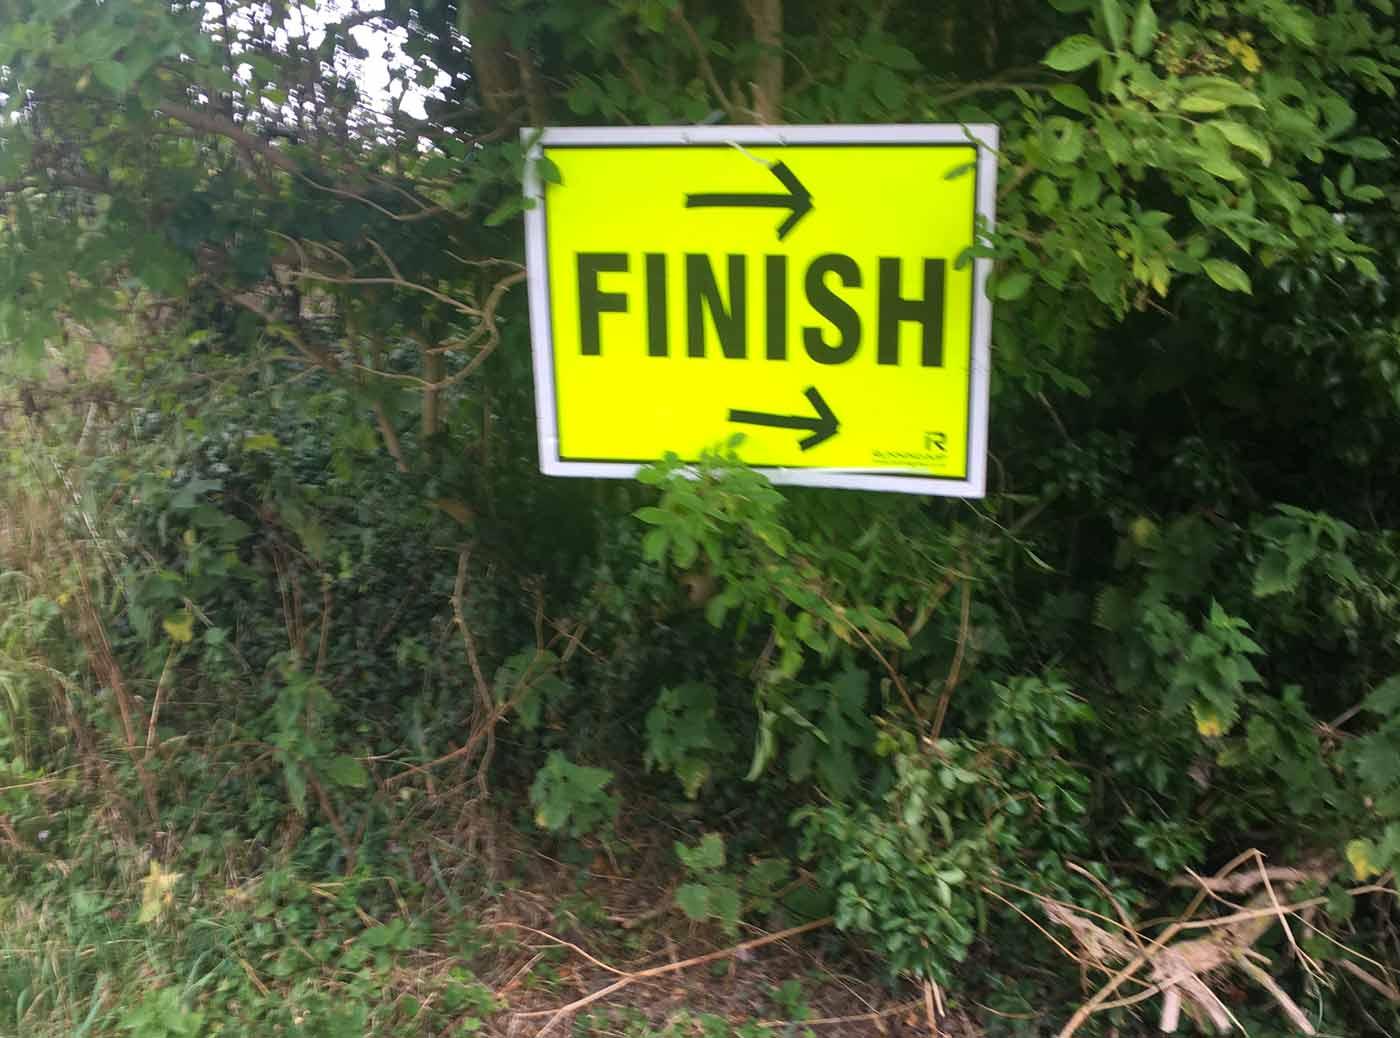 Race finish sign